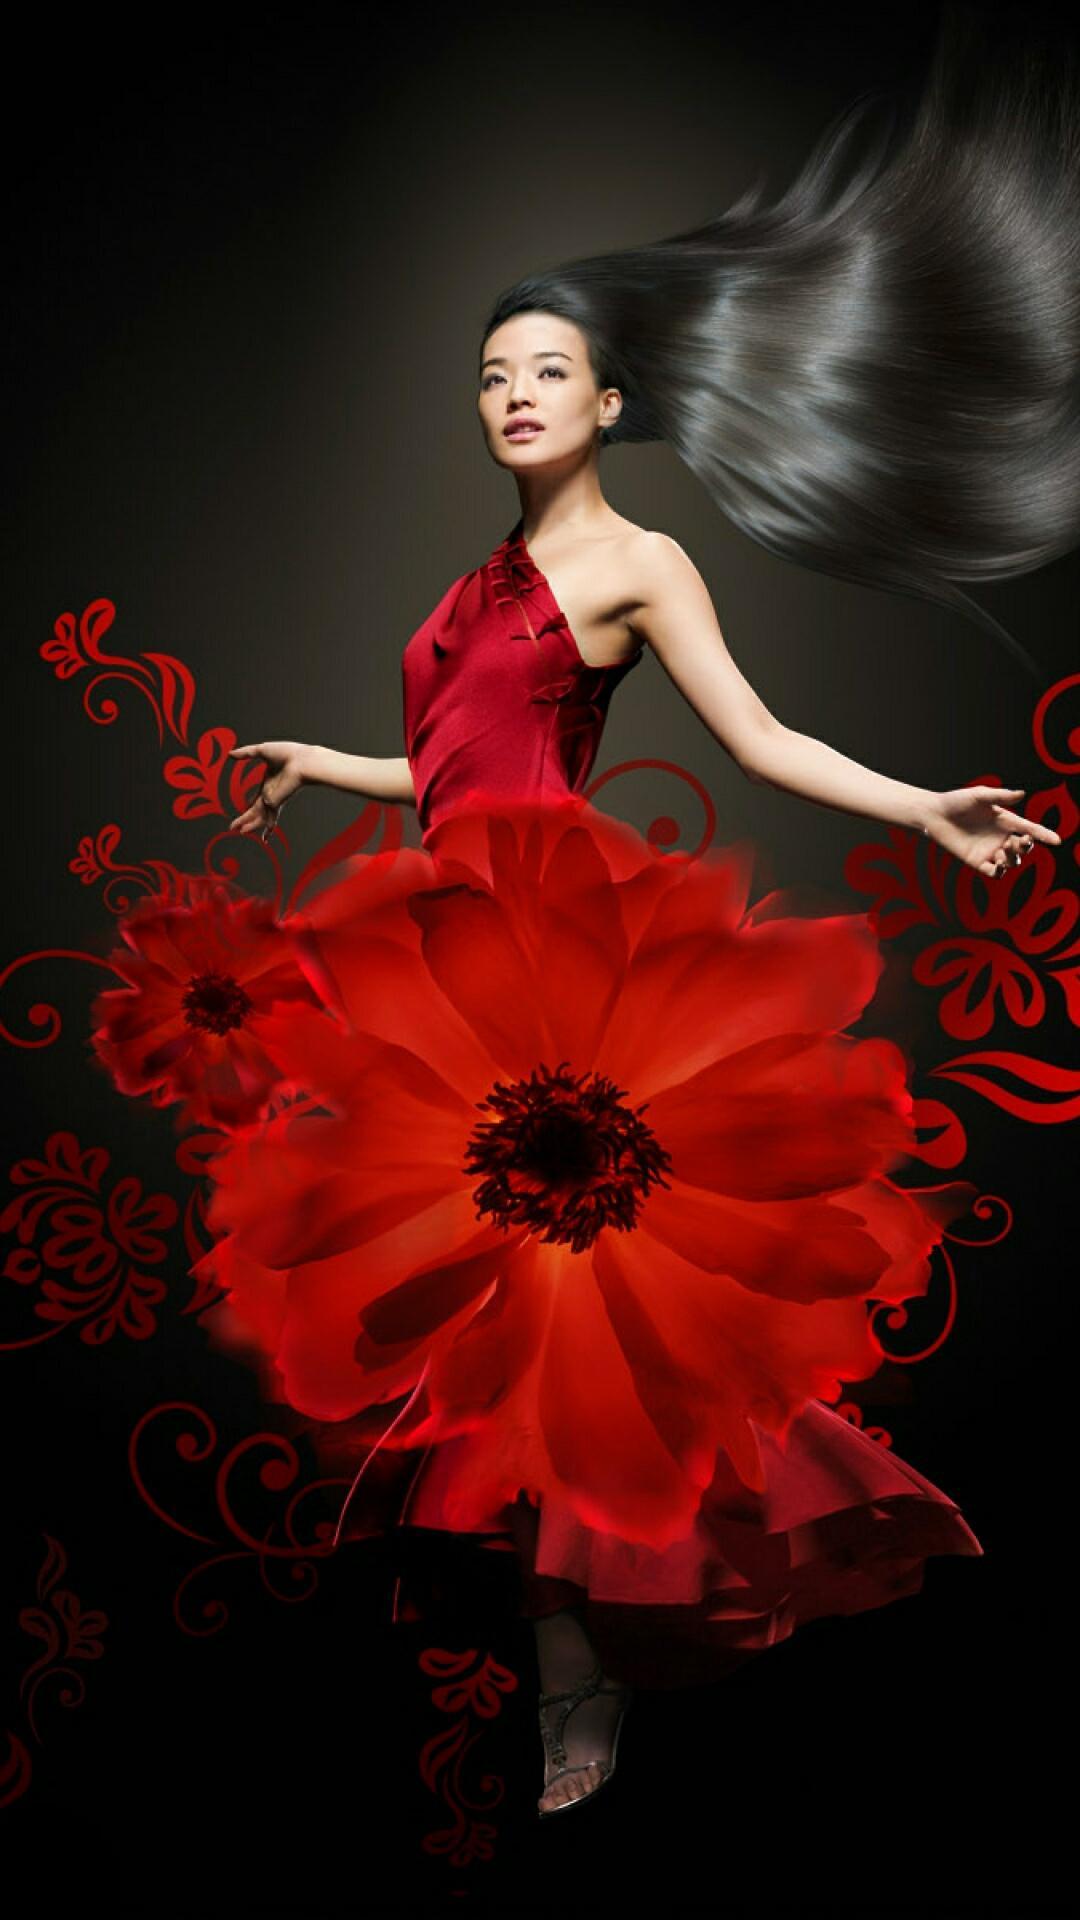 Фото девушка как цветок